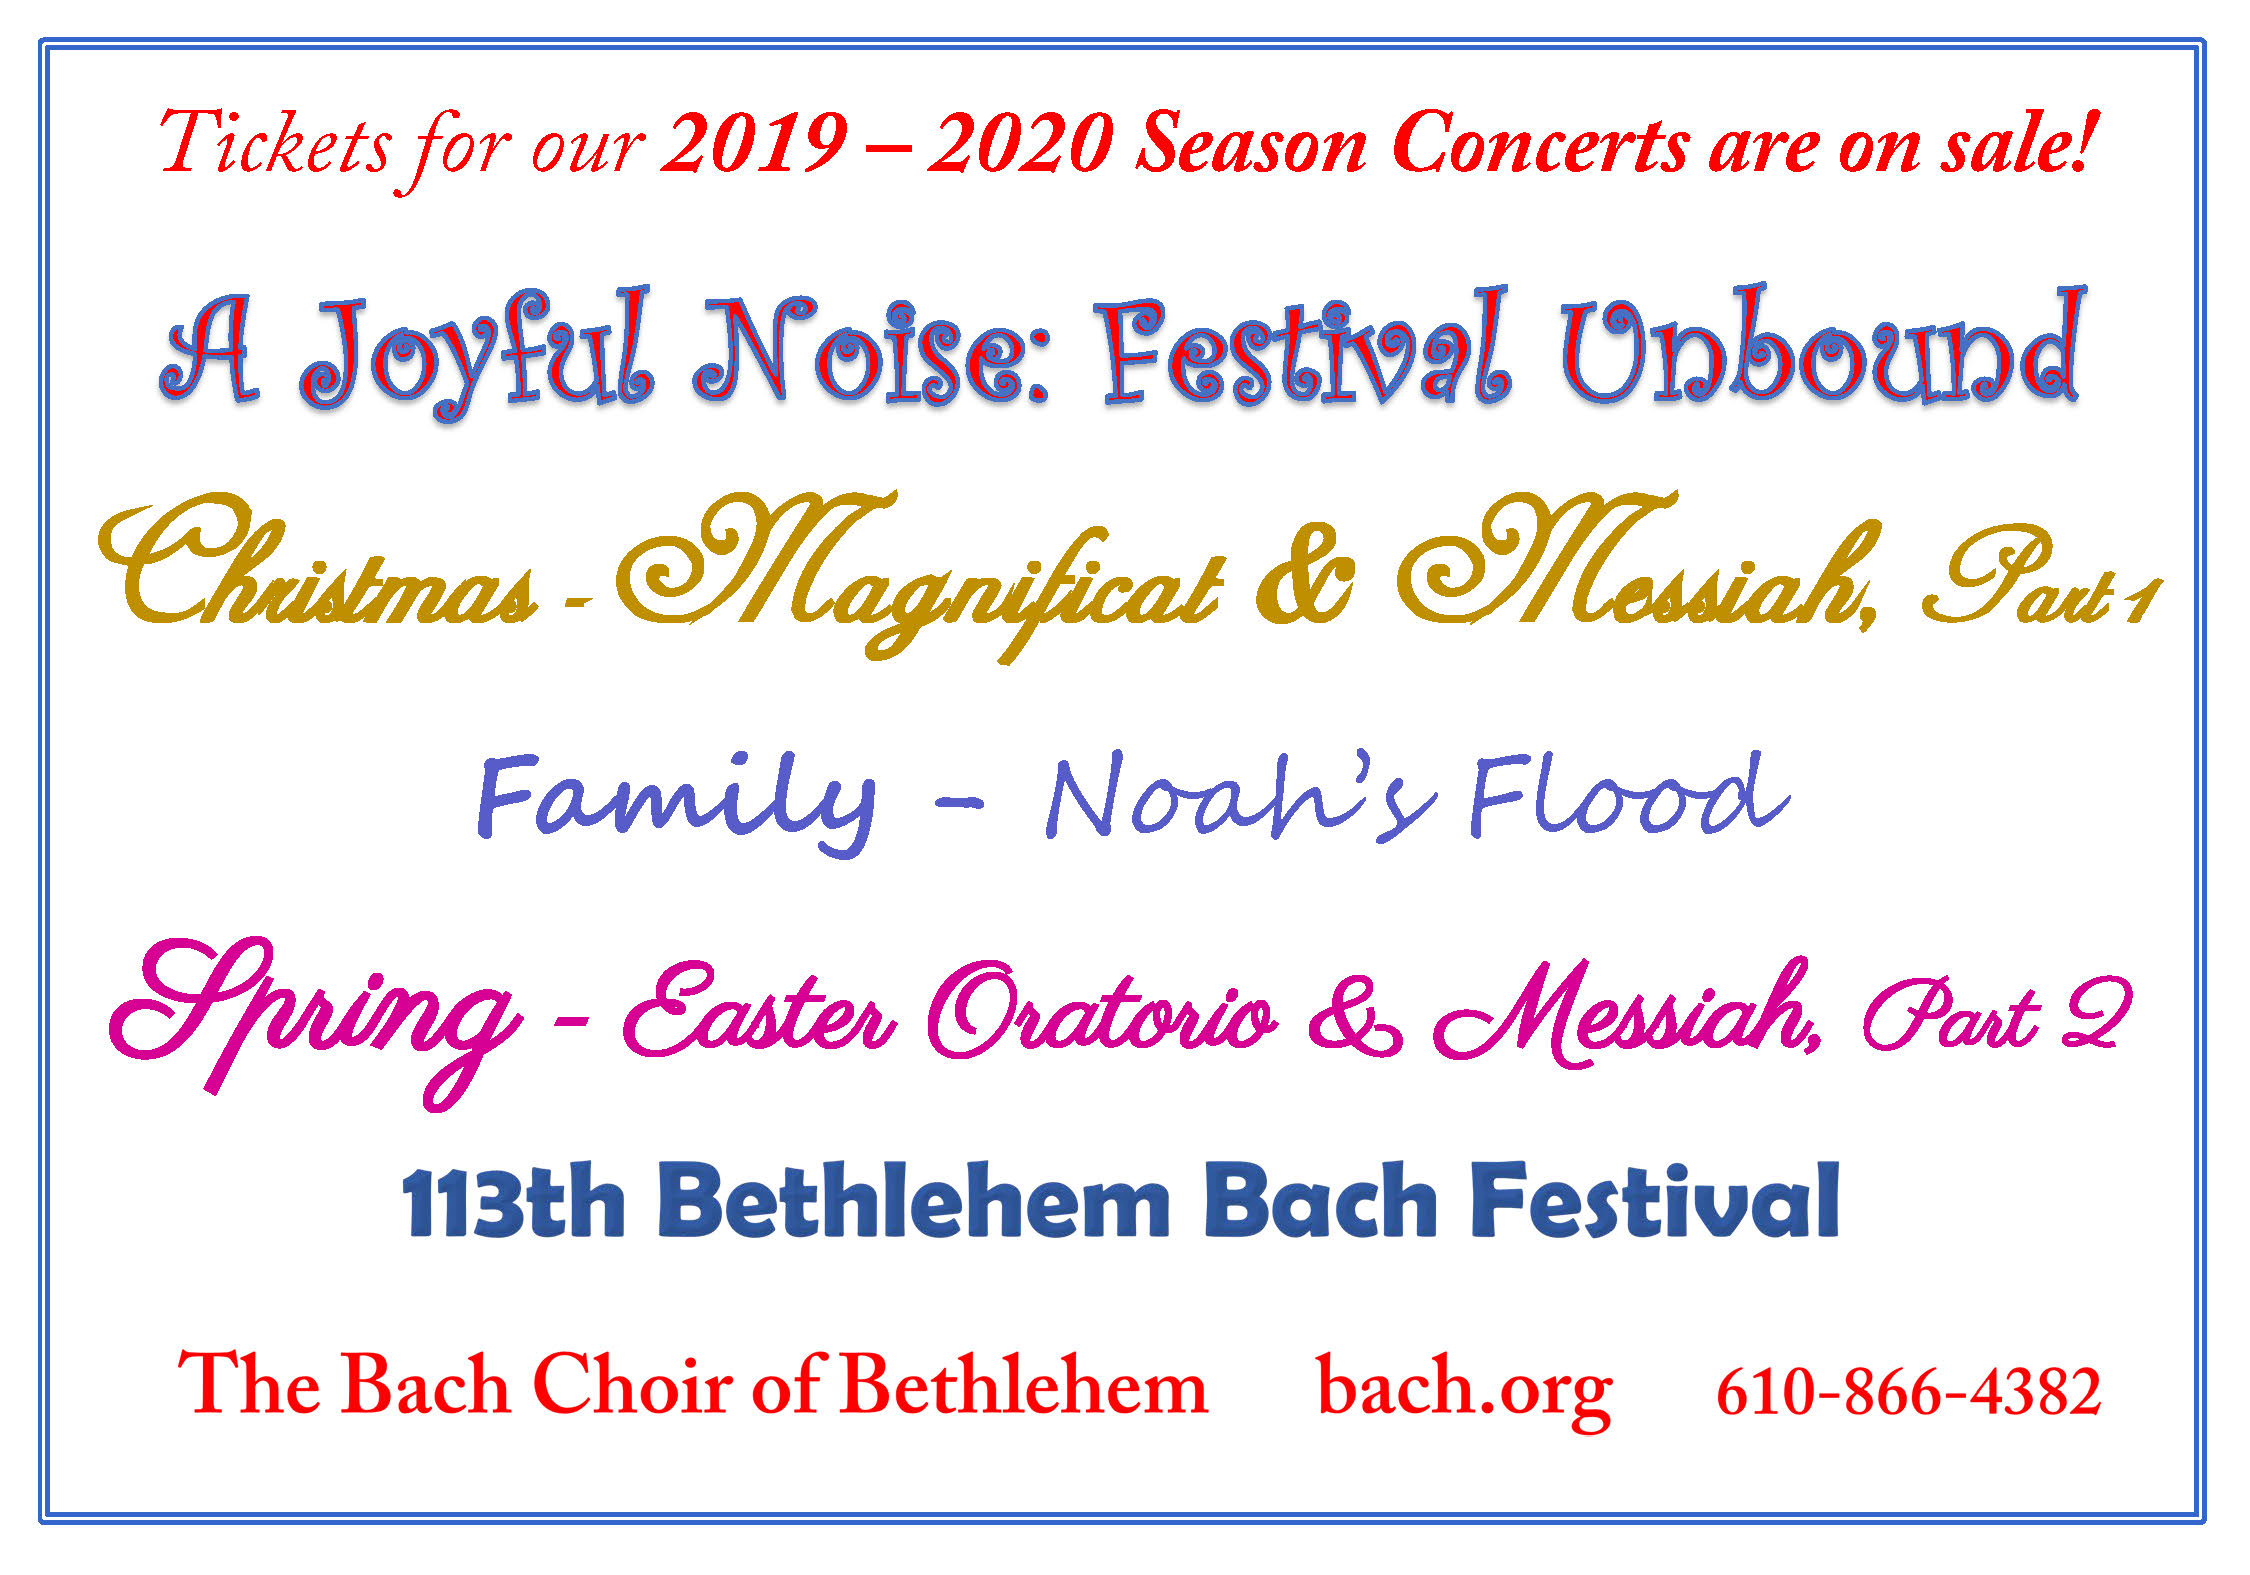 Allentown Fall Festival 2020 2017 2018 Season & 111th Bethlehem Bach Festival   The Bach Choir